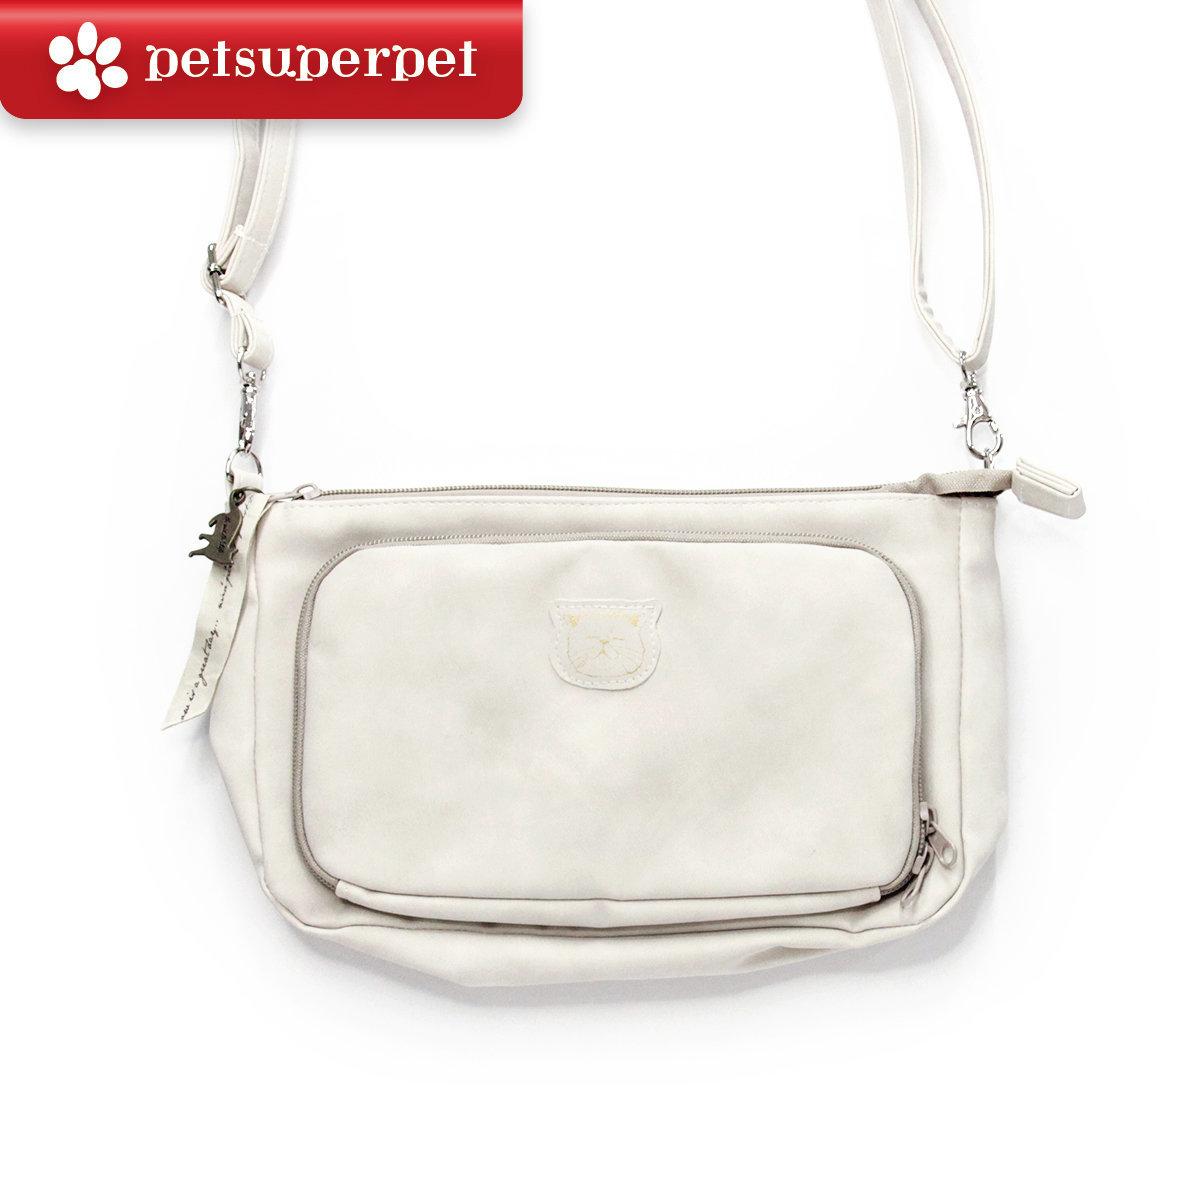 Medium-sized cute cat cross body bag - White